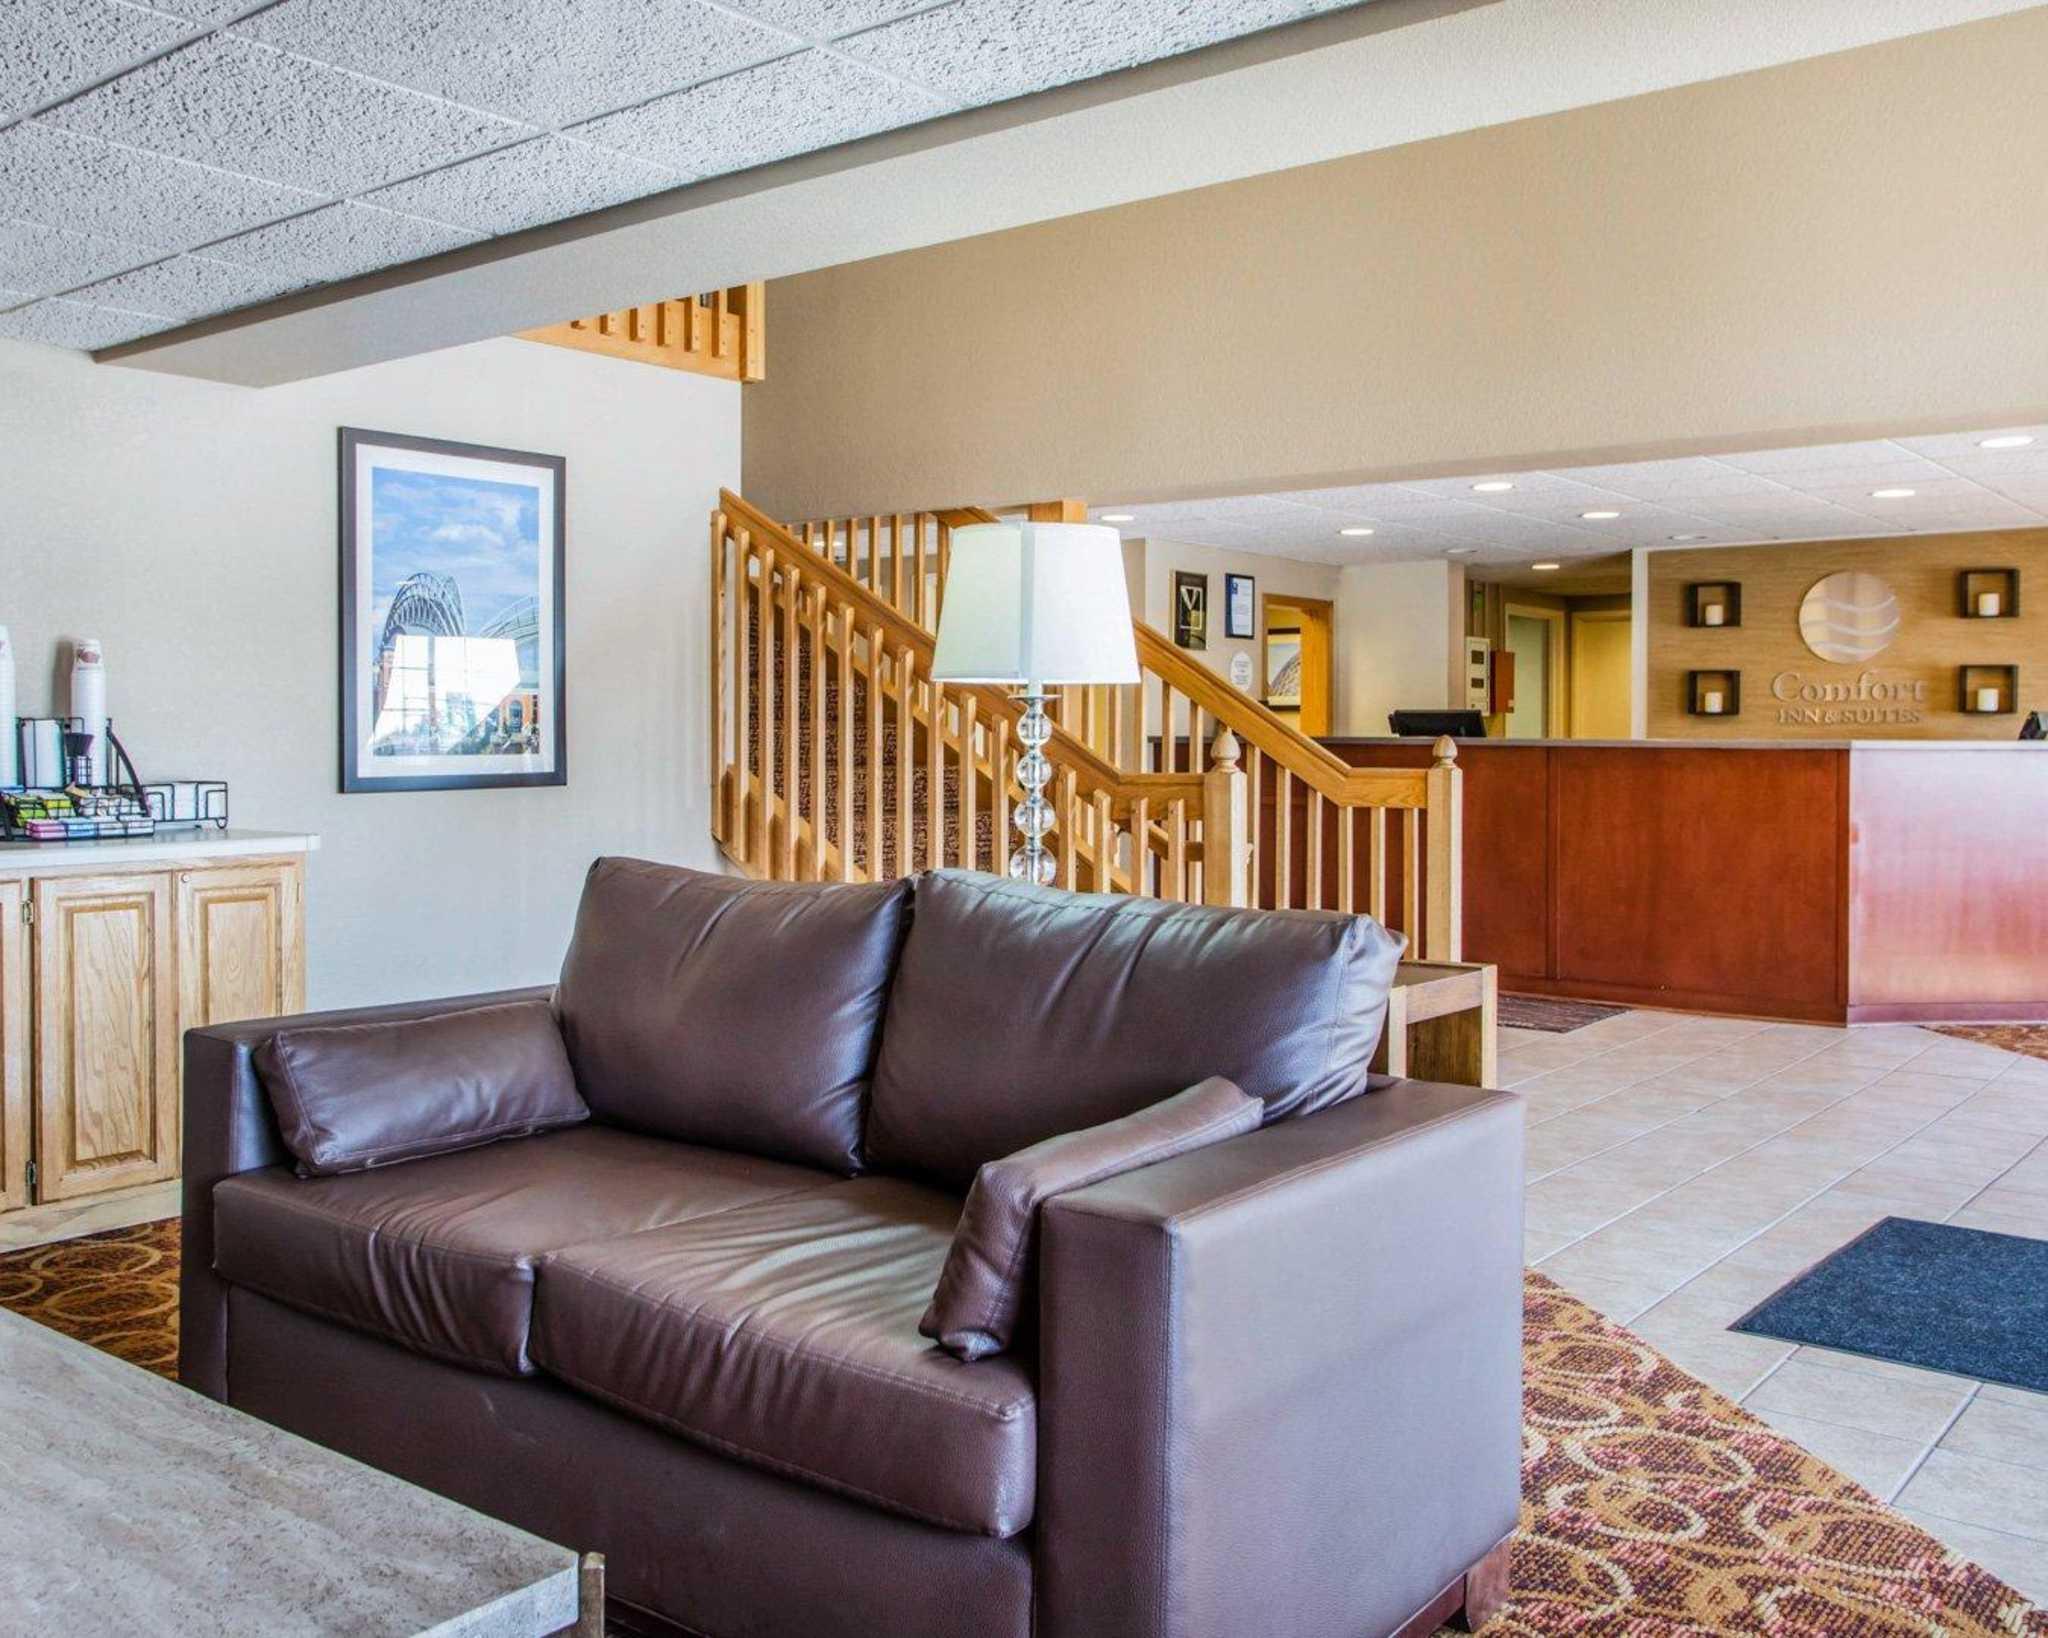 Comfort Inn & Suites Jackson - West Bend image 17